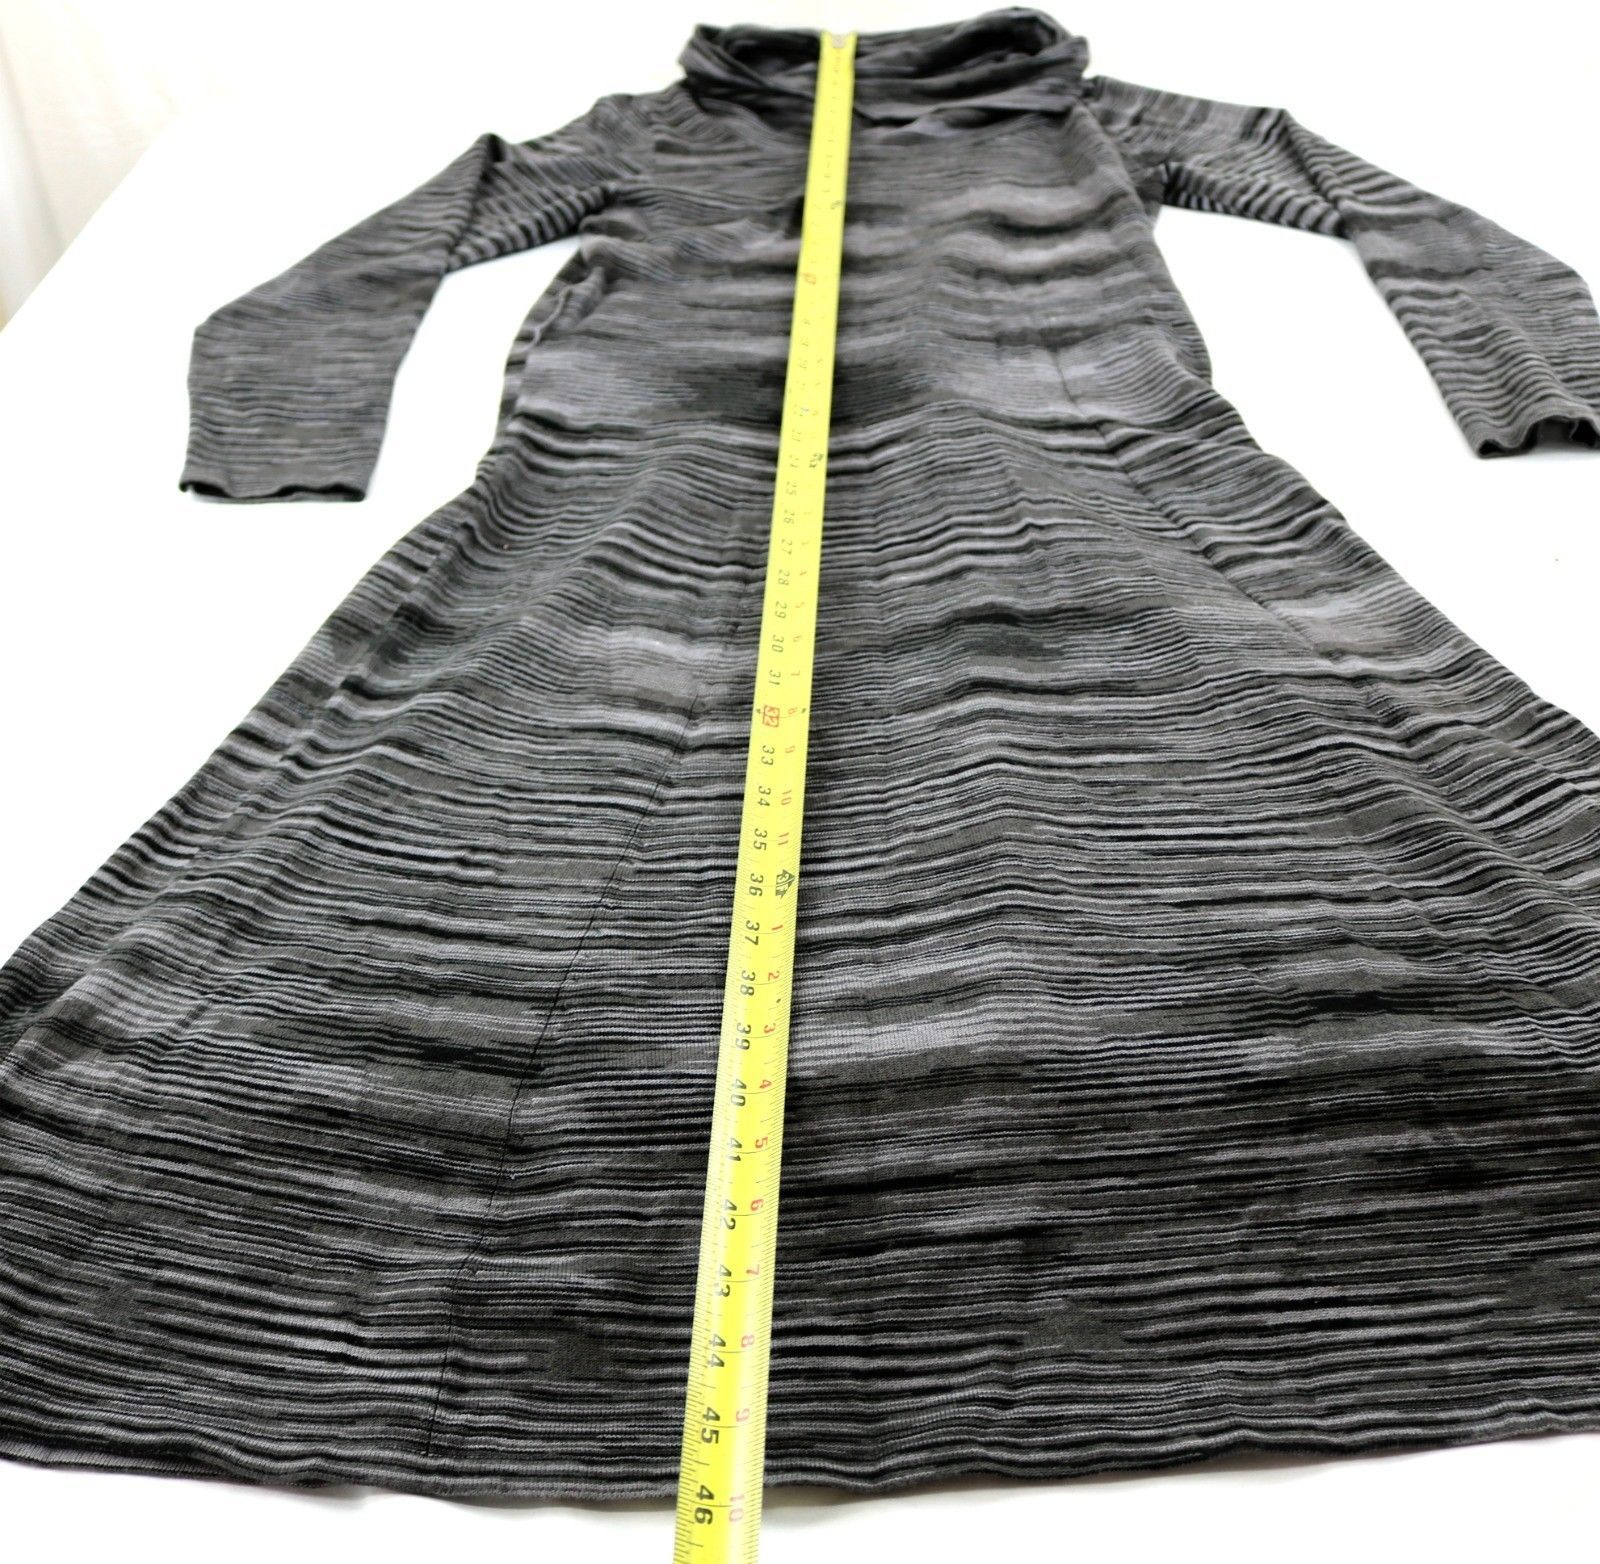 R&K Originals sz M Cowl Neck Sweater Dress Full Skirt Black White Variegated image 4